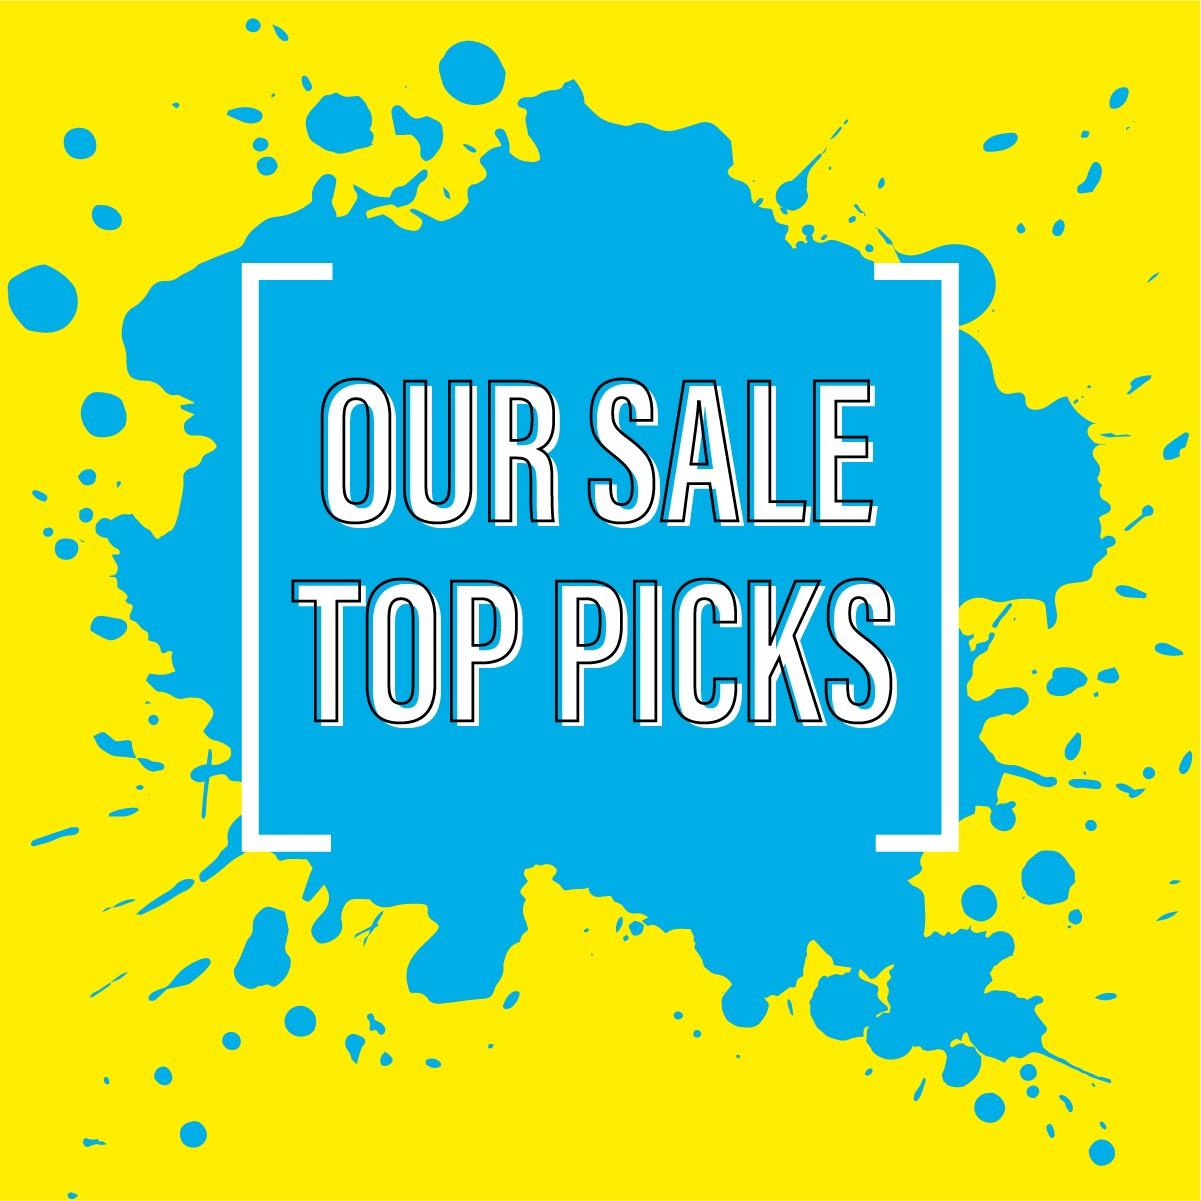 Sale Top Picks